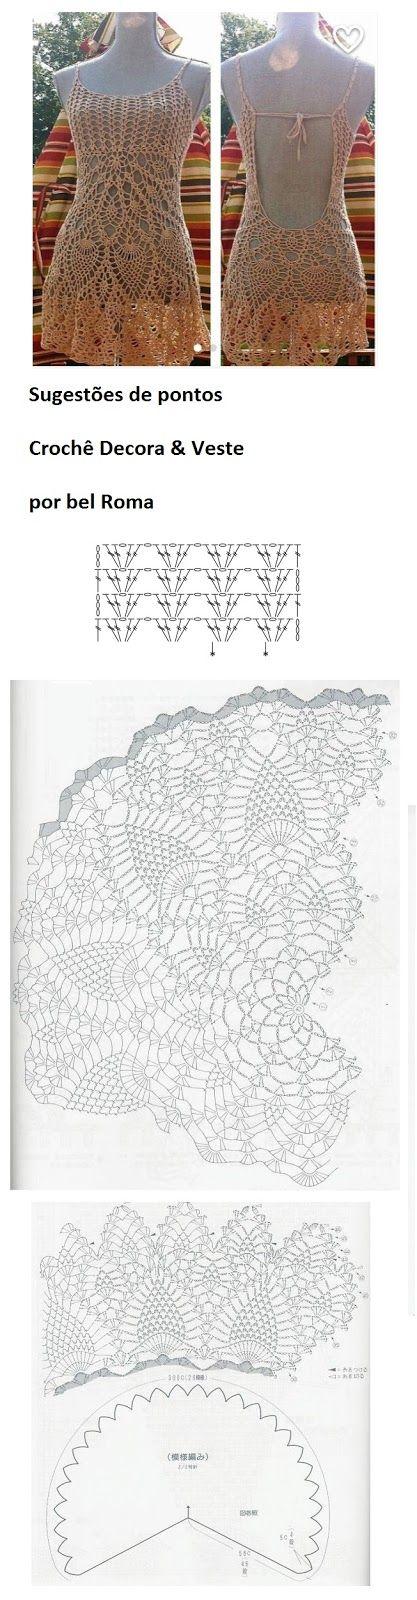 Crochê Decora & Veste: Vestidos Com Gráficos #1 | vestido crochet ...